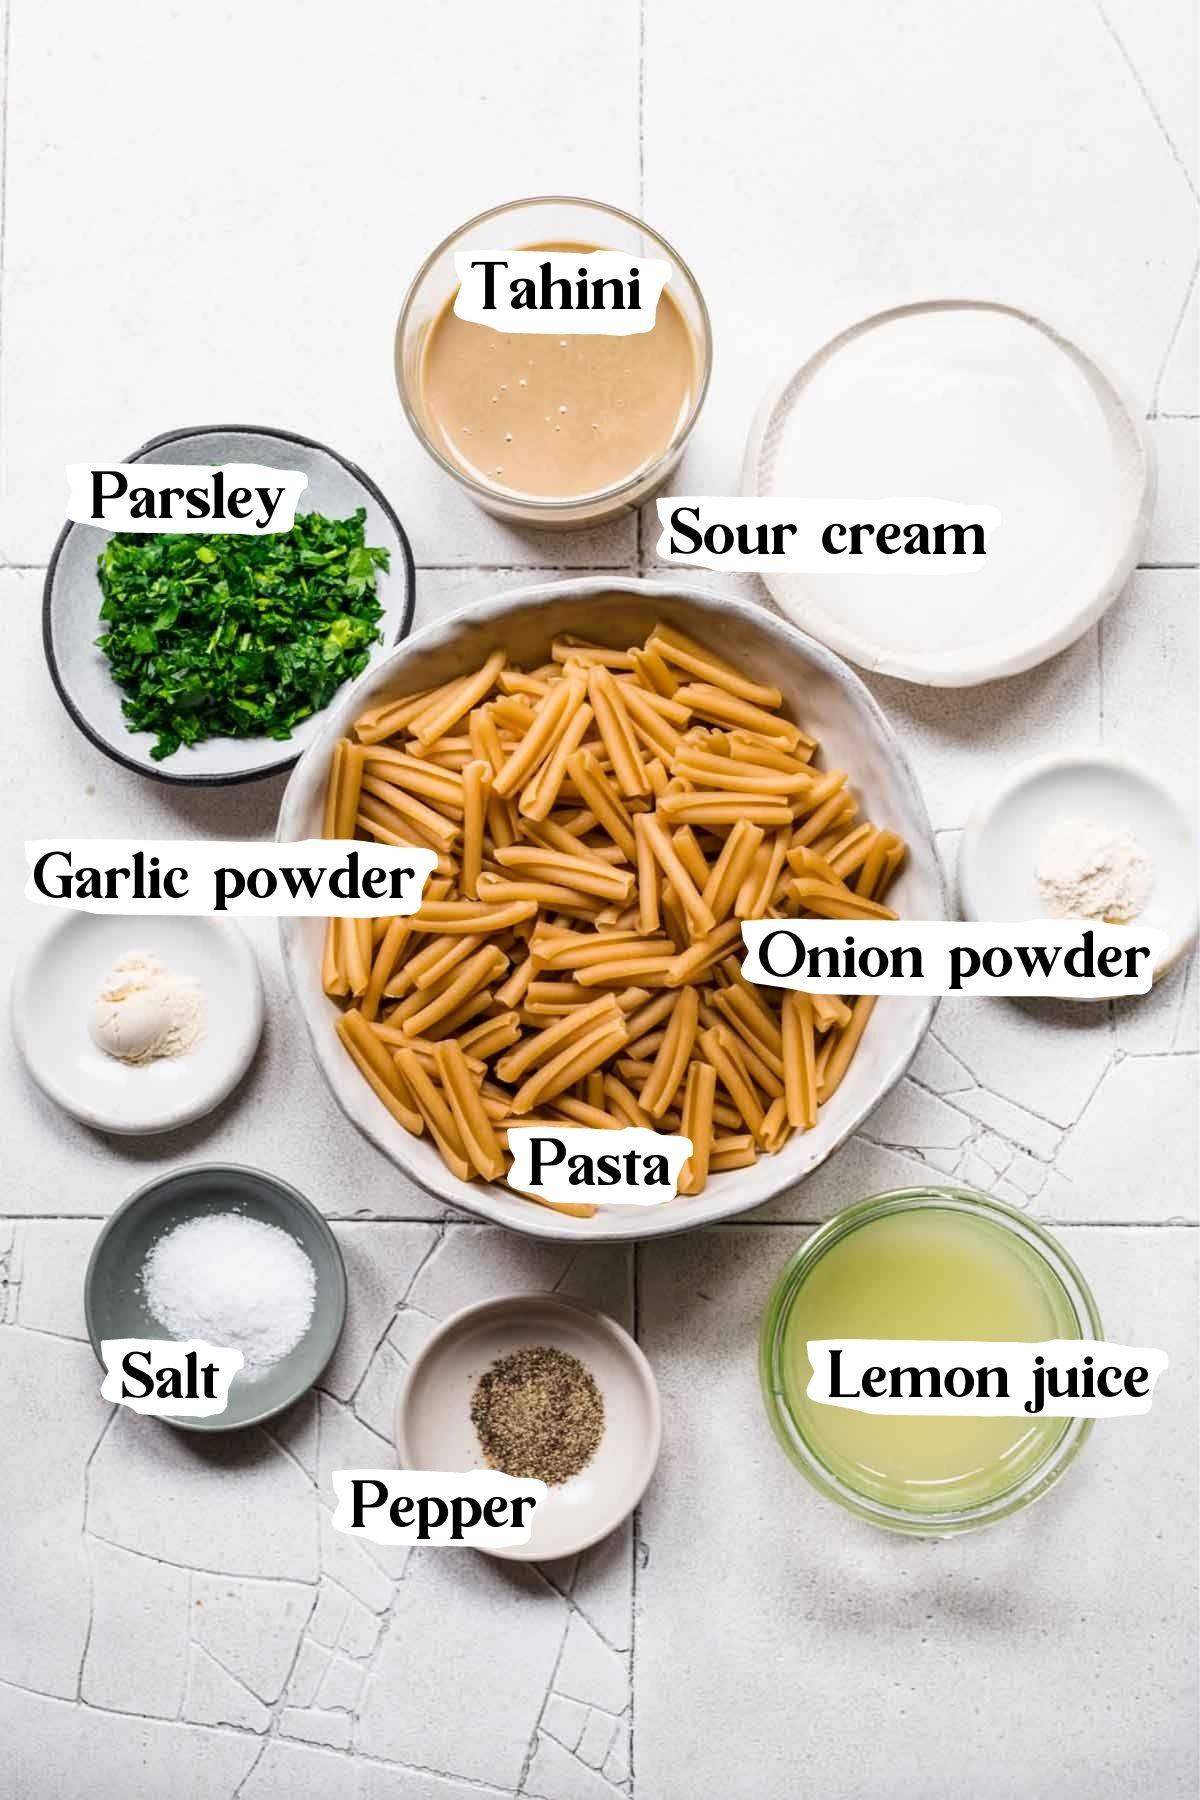 Overhead view of ingredients used in the tahini pasta, including tahini, parsley, and lemon juice.